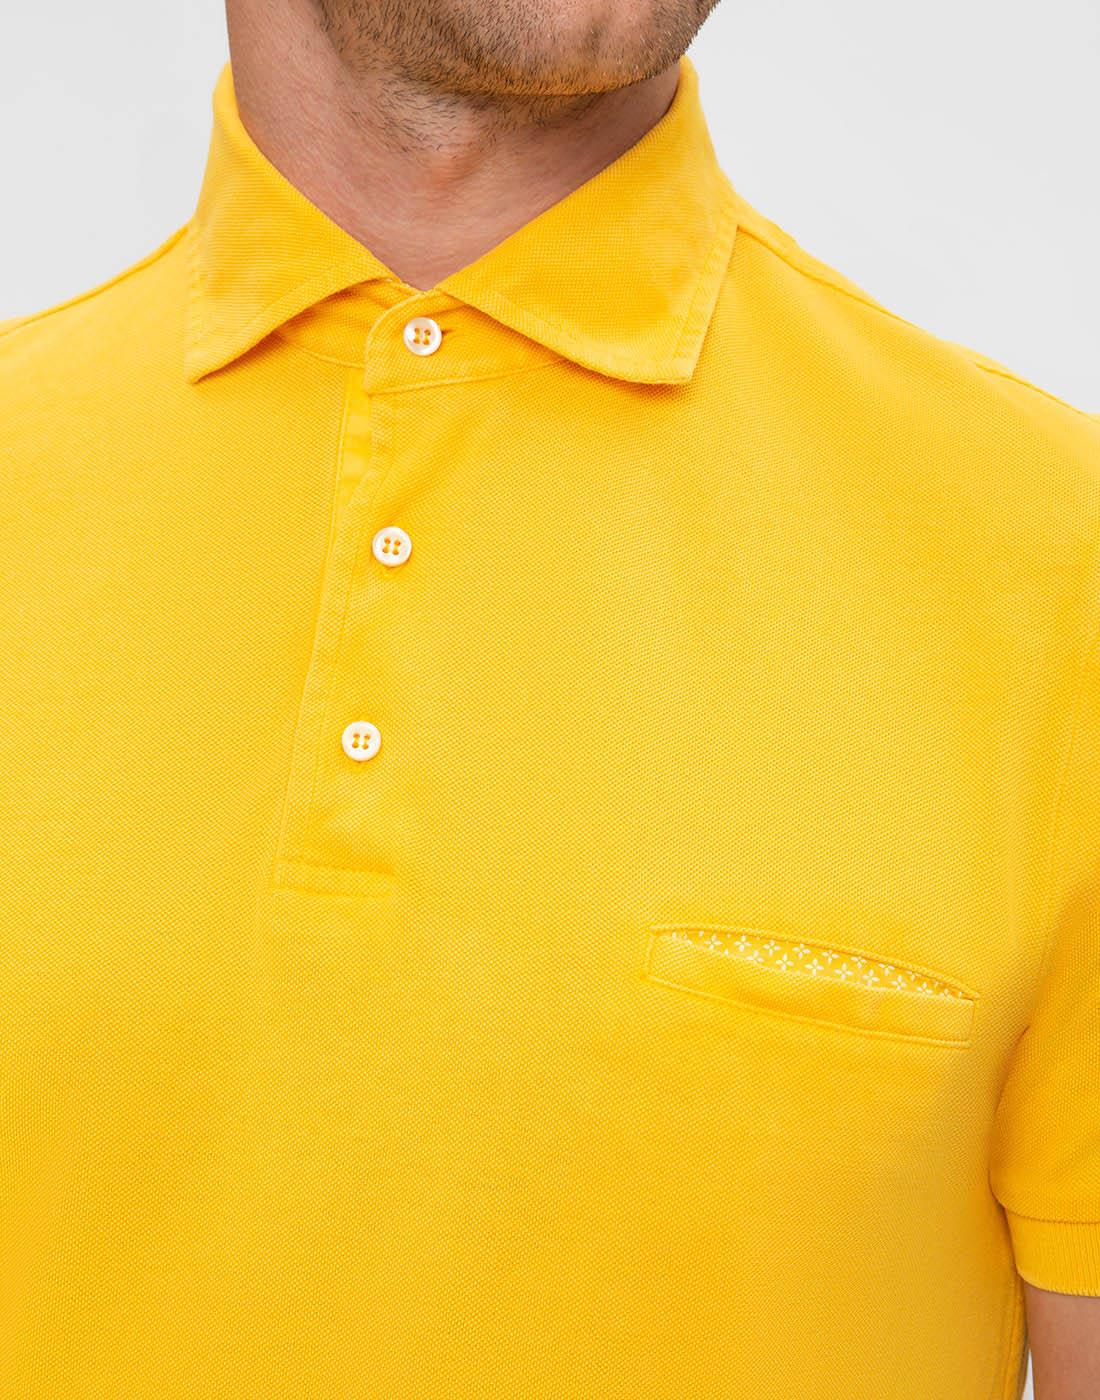 Мужское желтое поло Della Ciana S43305L/37715-5